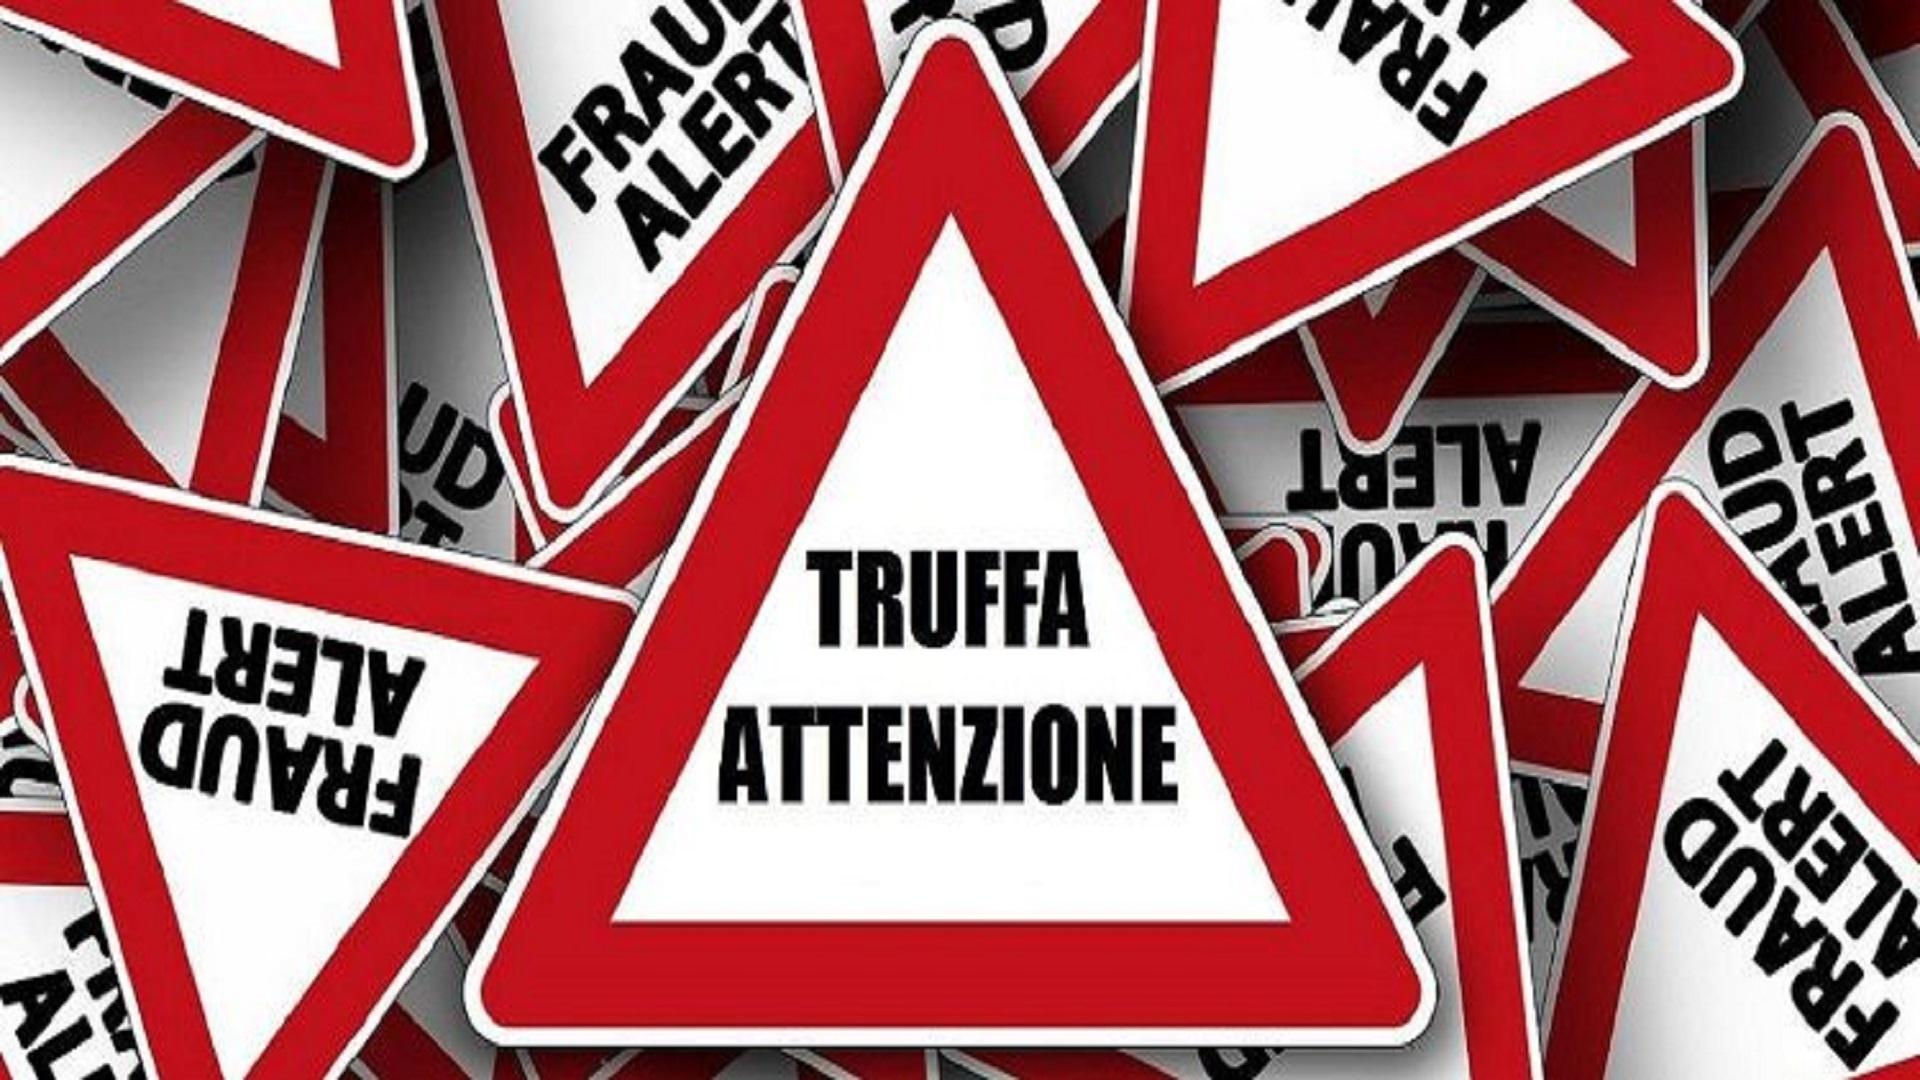 truffa